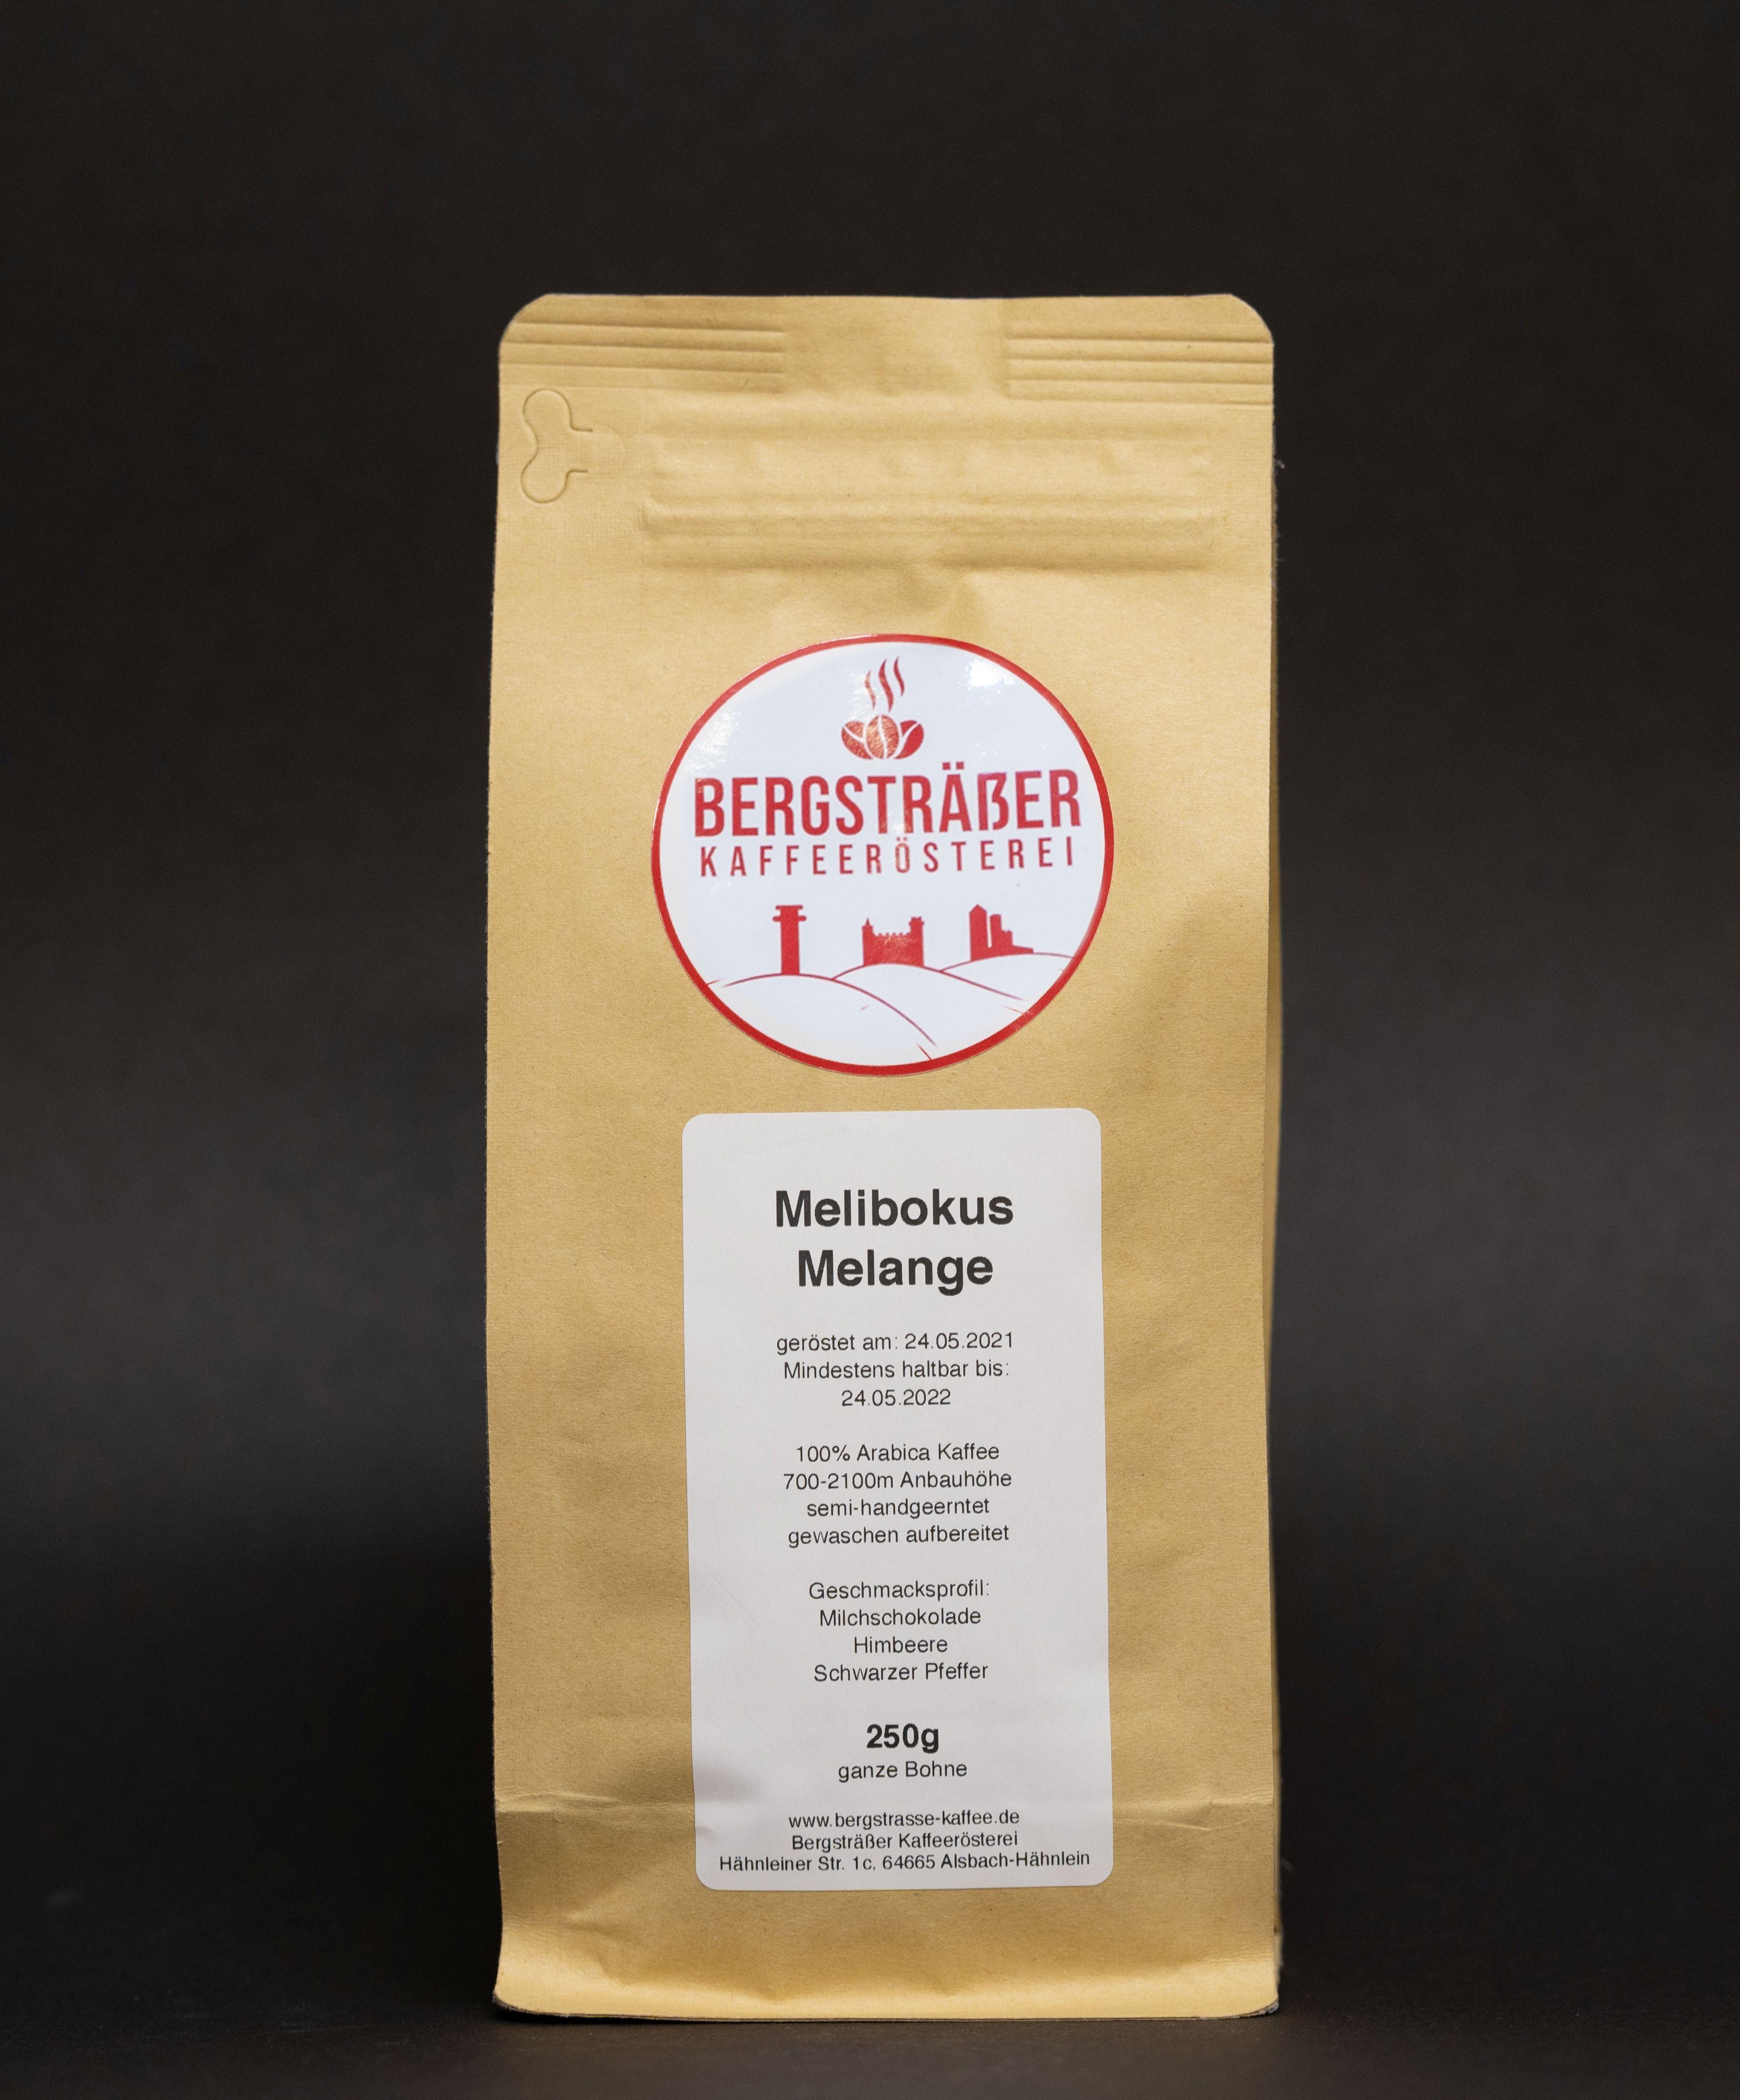 Melibokus Melange - Kaffee